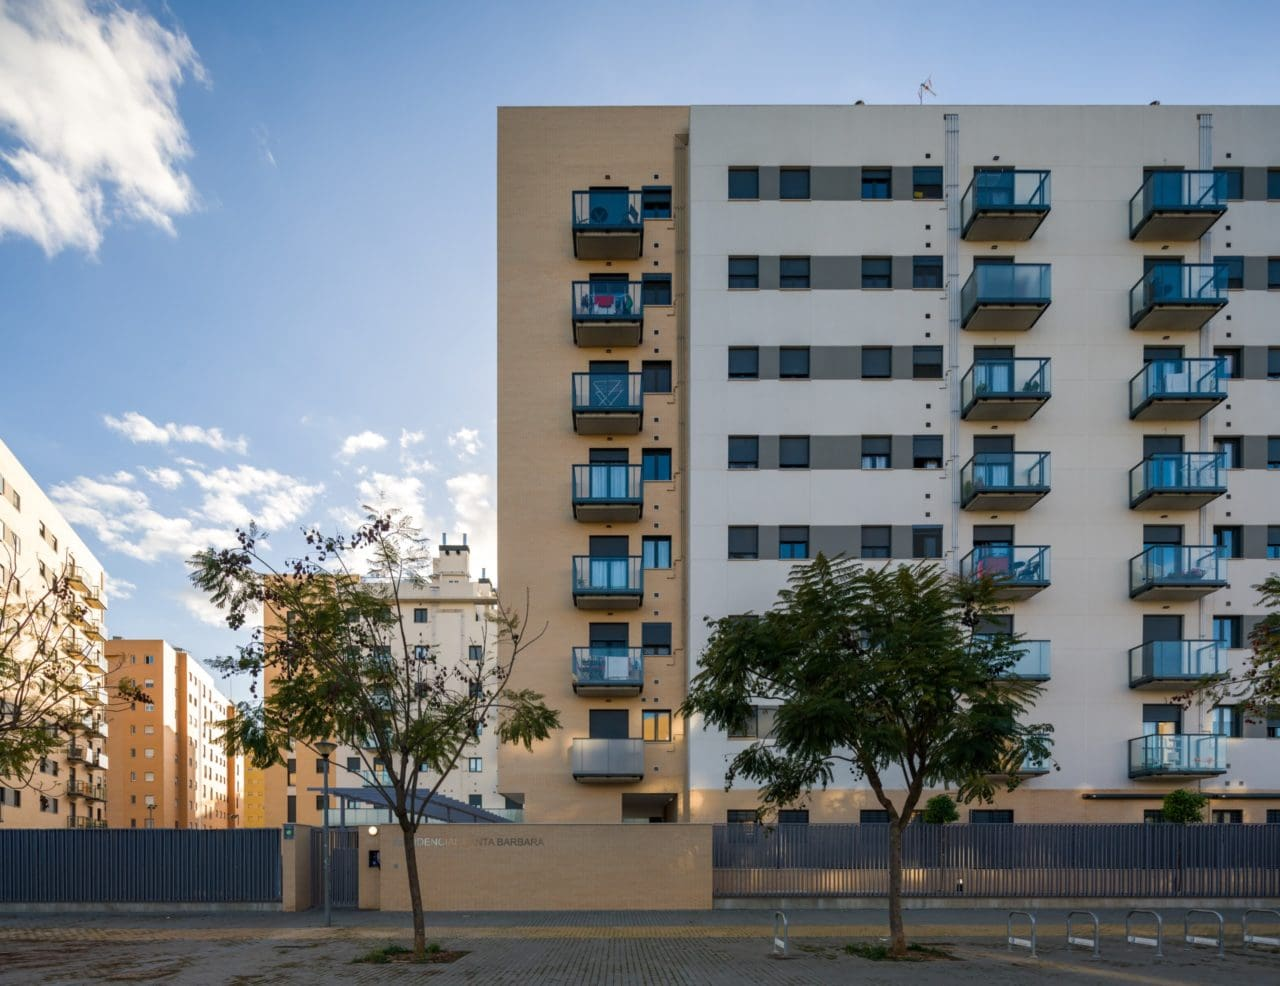 Acceso a la urbanización Santa Bárbara